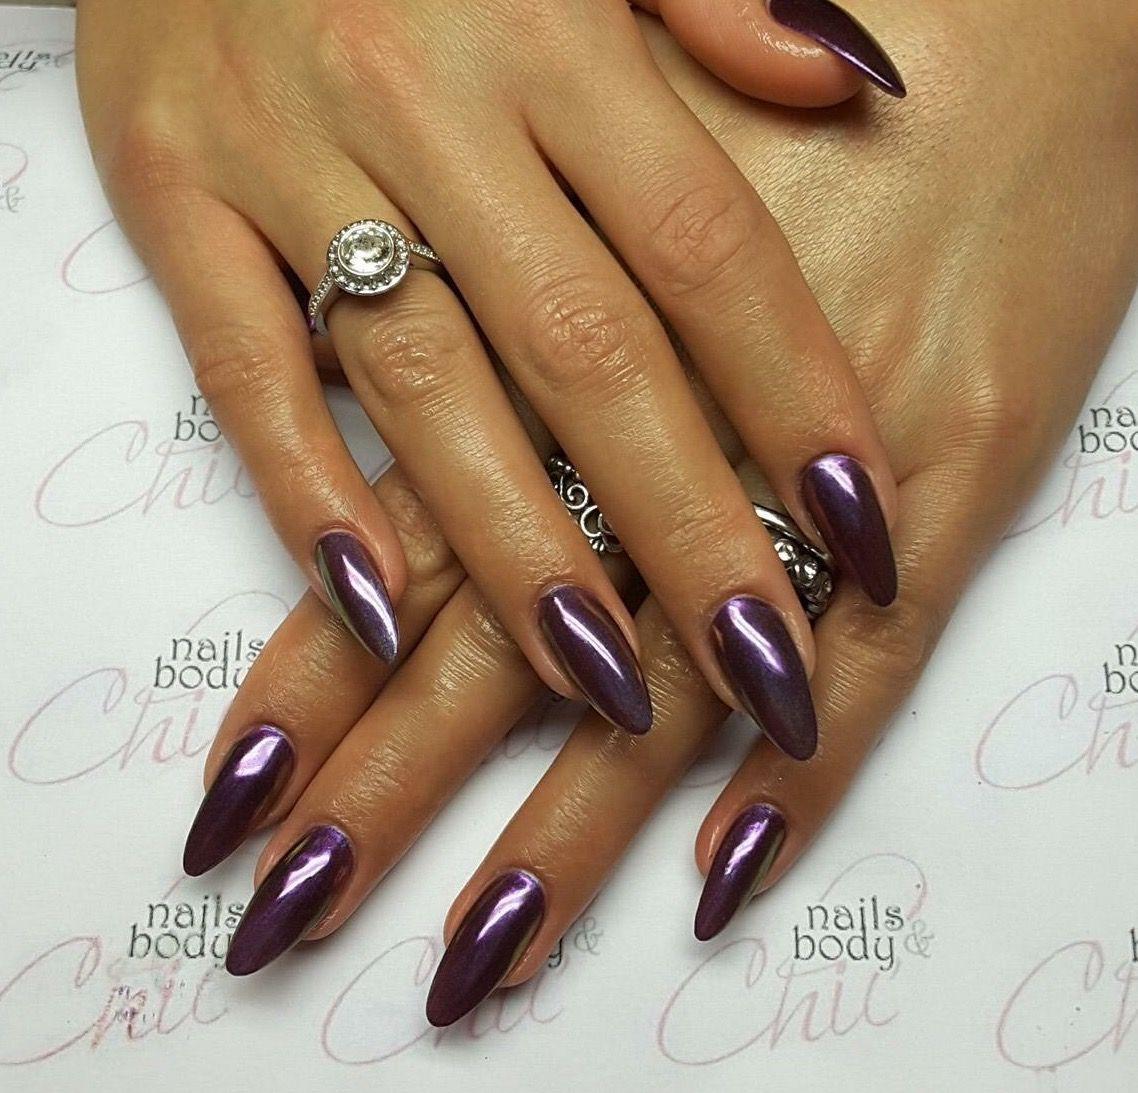 Unghie viola effetto specchio nails pinterest - Unghie effetto specchio ...